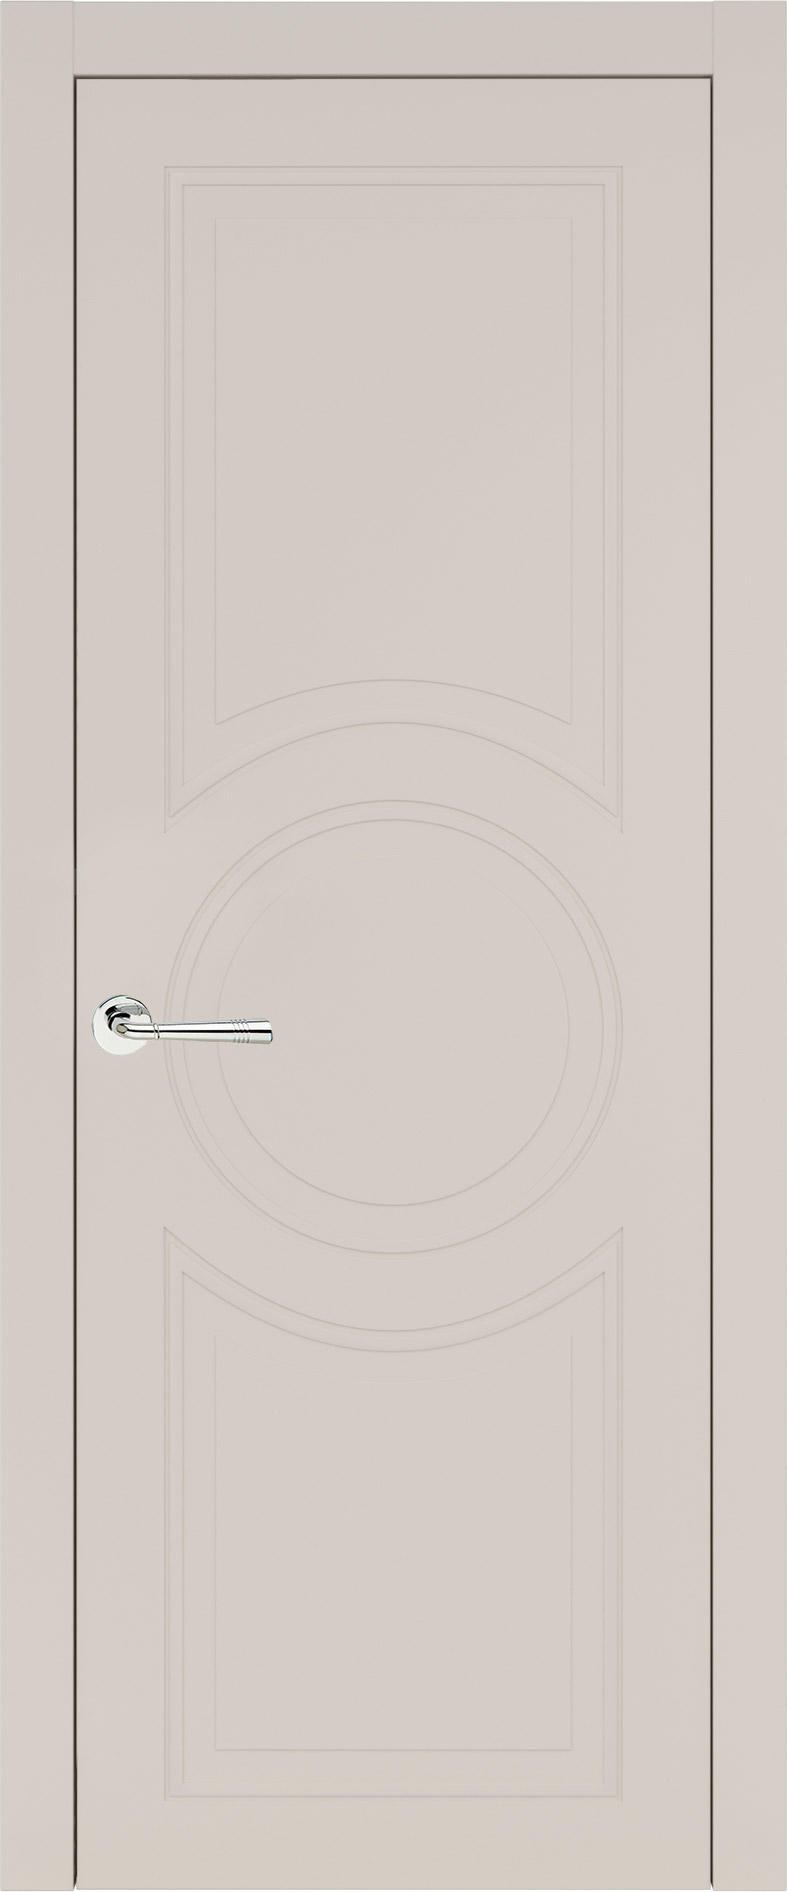 Ravenna Neo Classic цвет - Жемчужная эмаль (RAL 1013) Без стекла (ДГ)